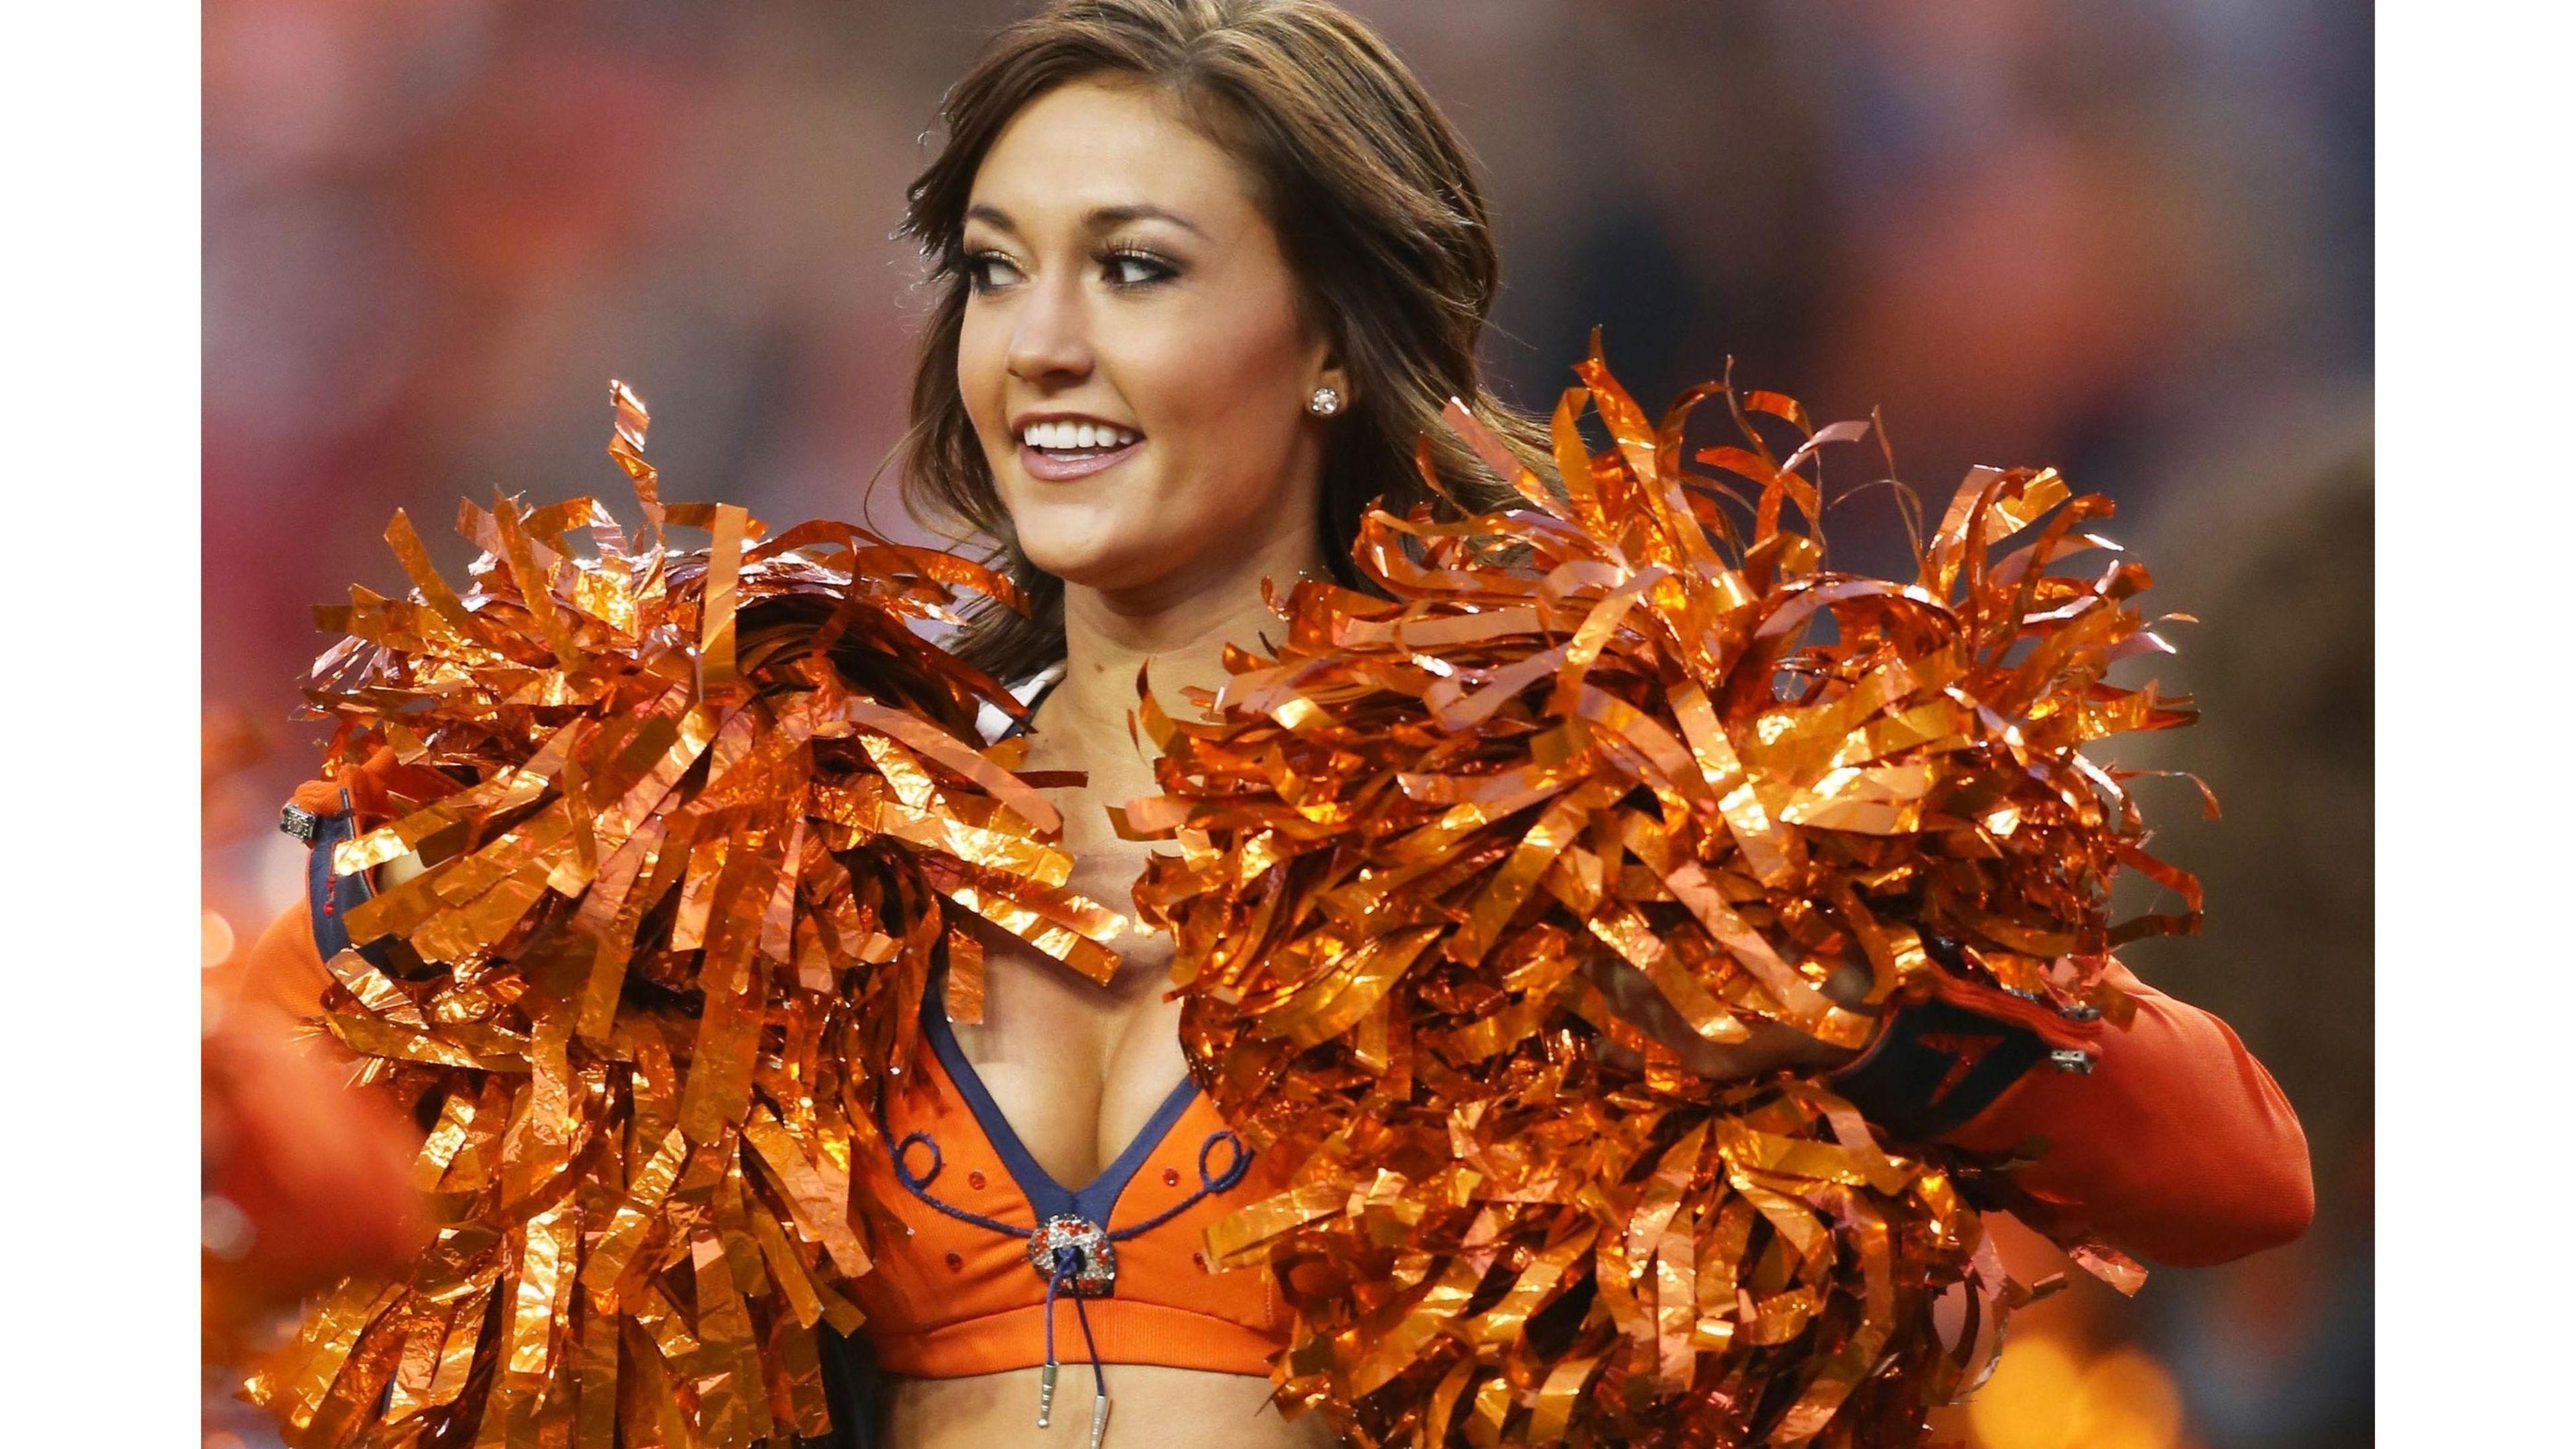 2017 Denver Broncos Cheerleaders 4K Wallpaper   Free 4K Wallpaper